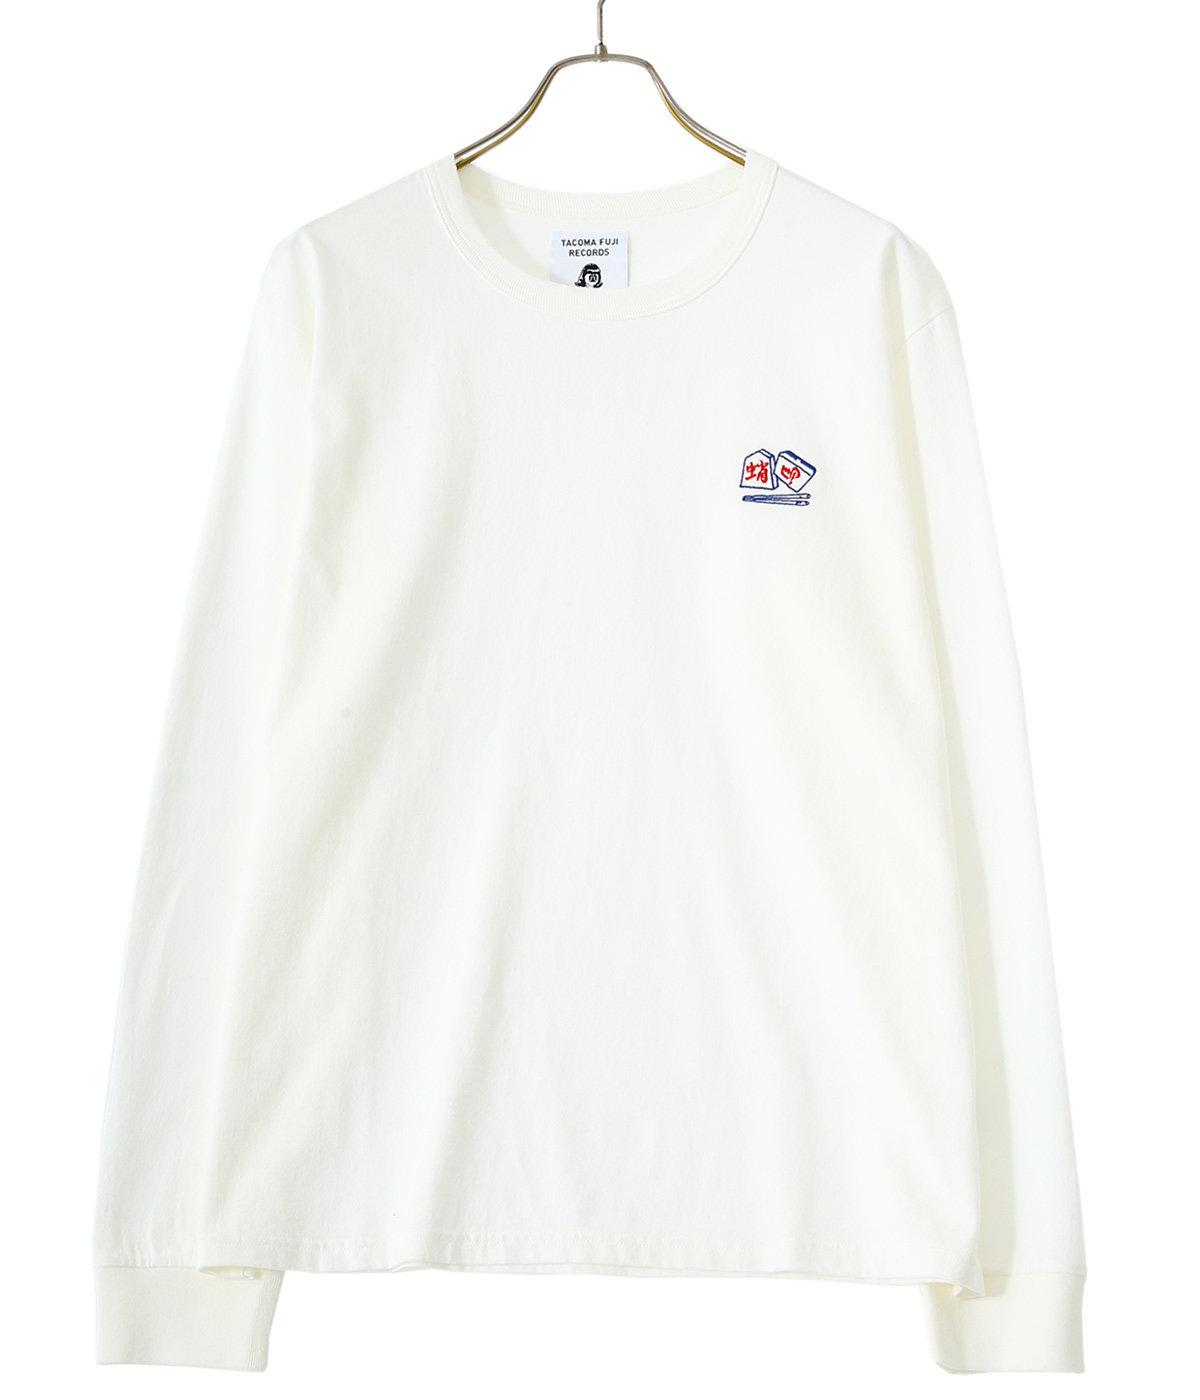 CHOPSTICKS CRISIS embroidery shirt